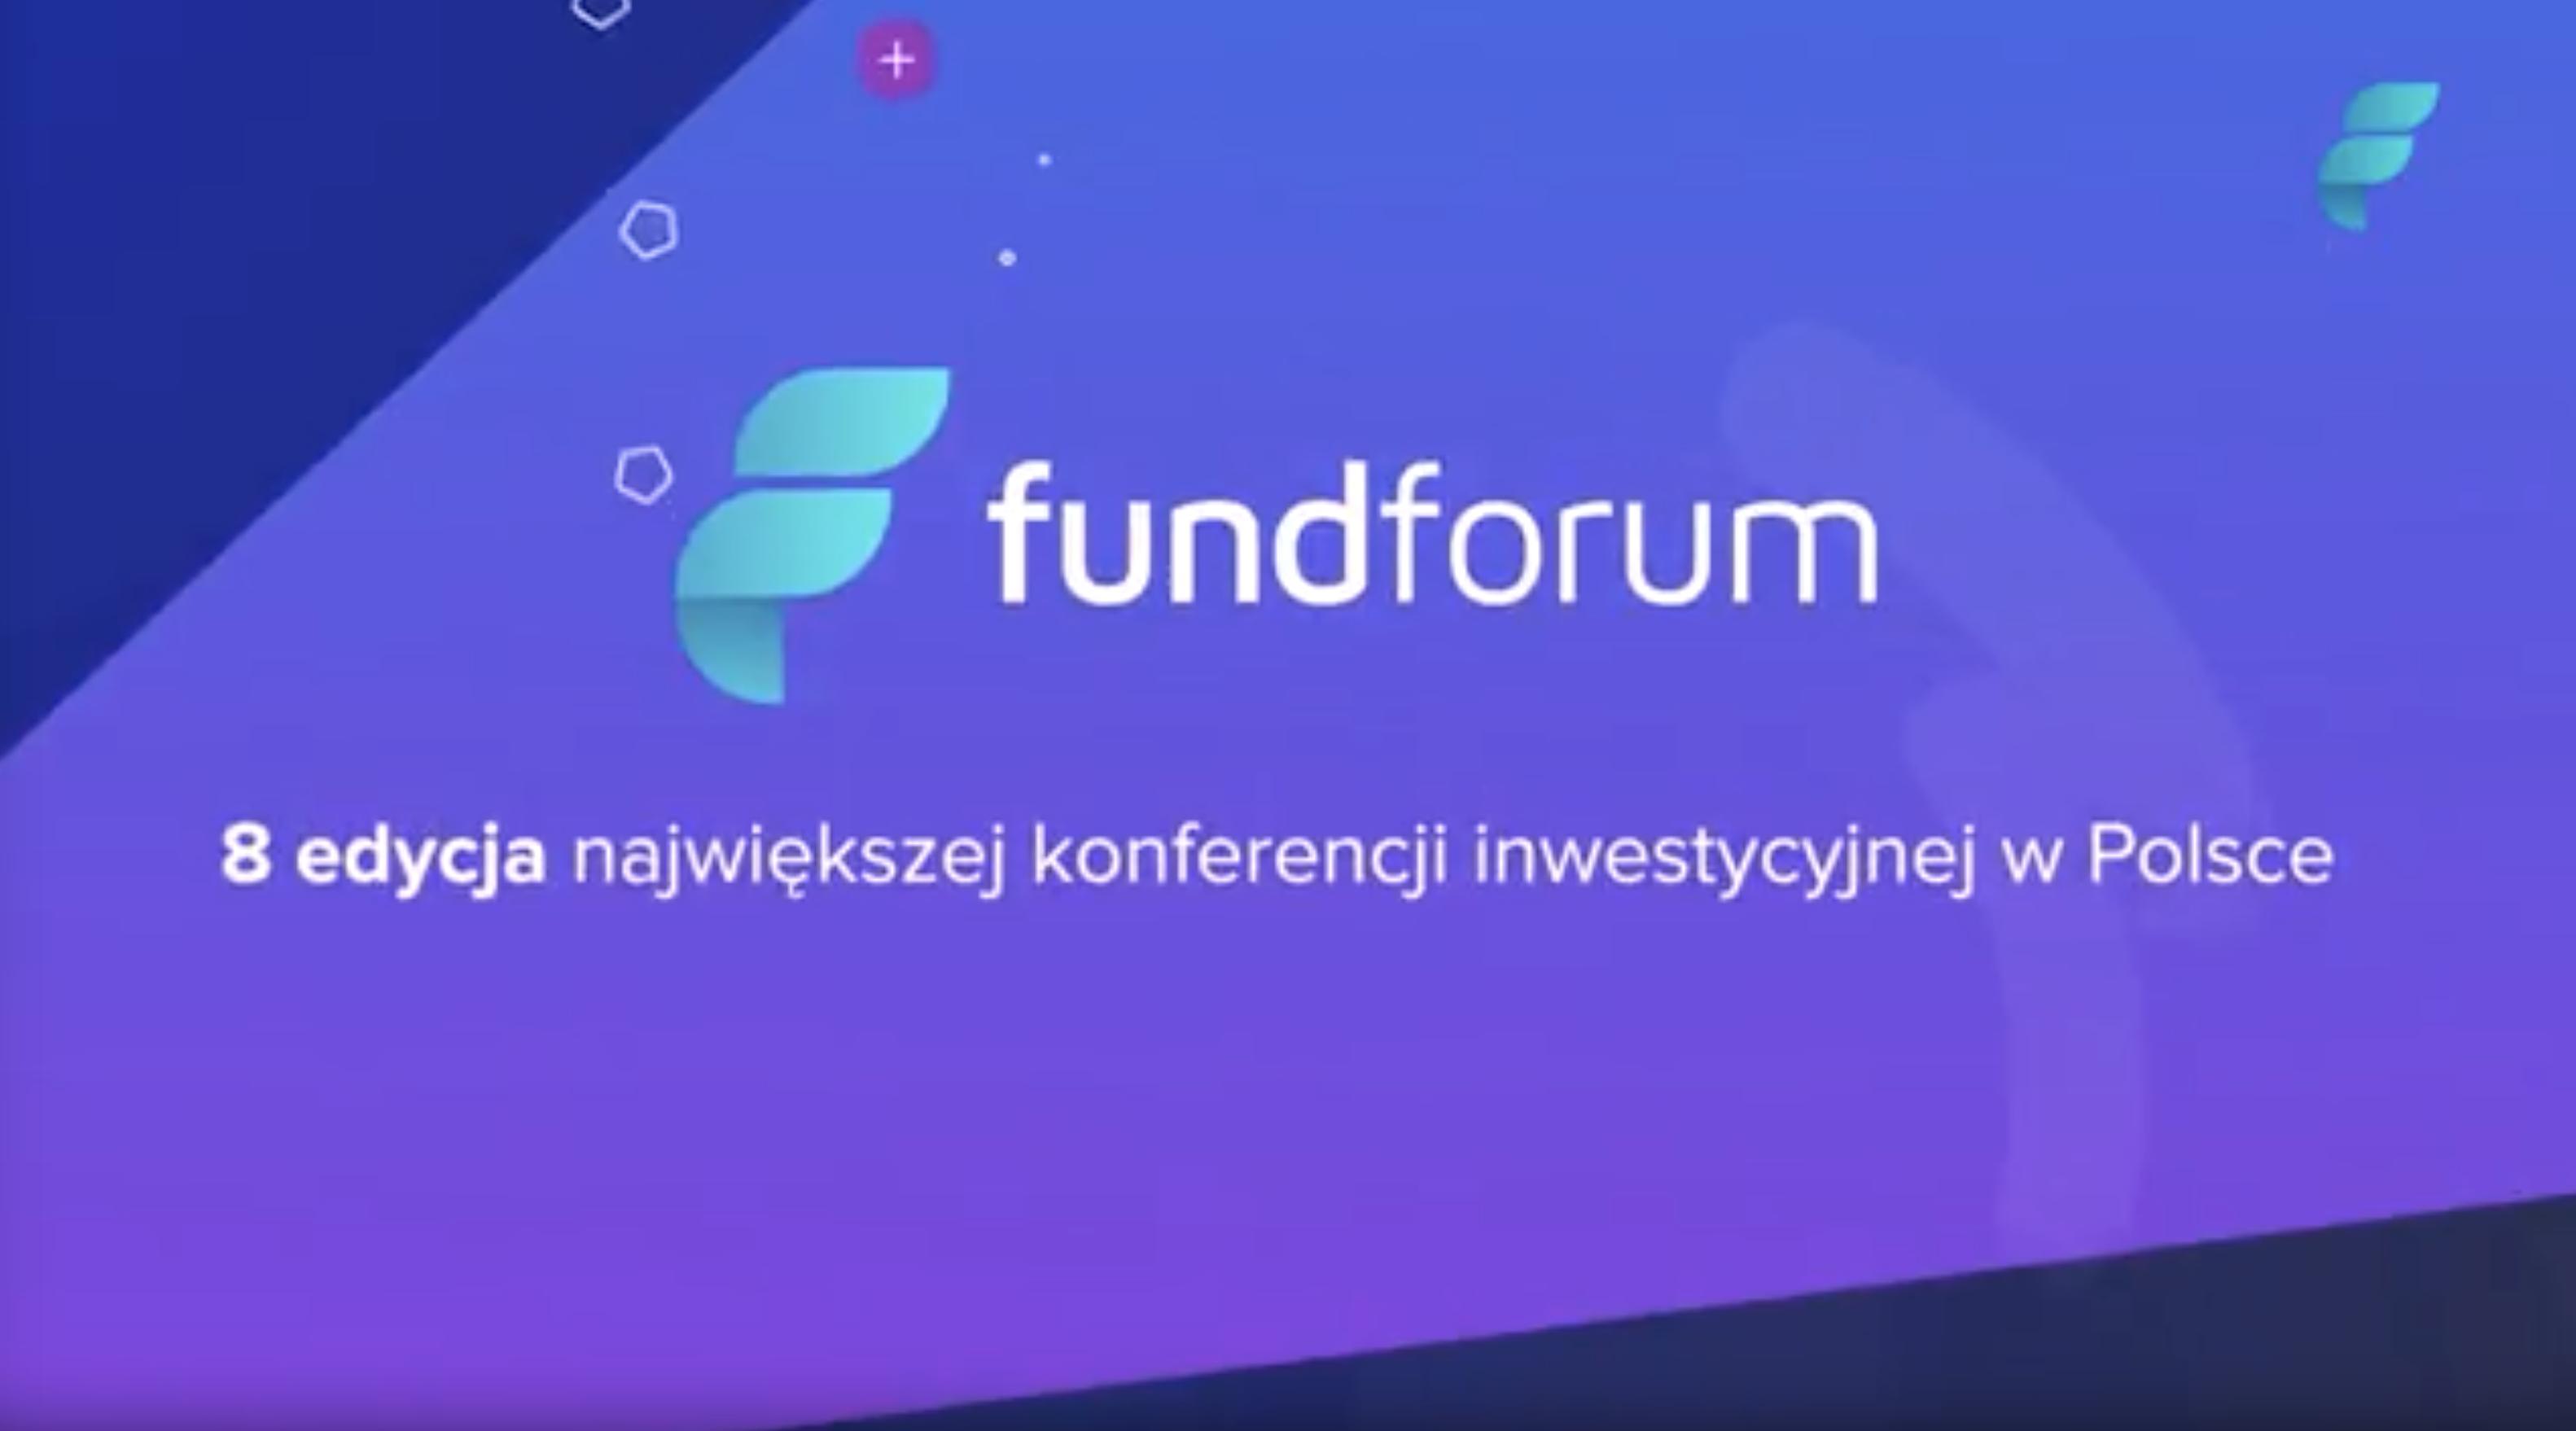 FundForum Norbert Biedrzycki